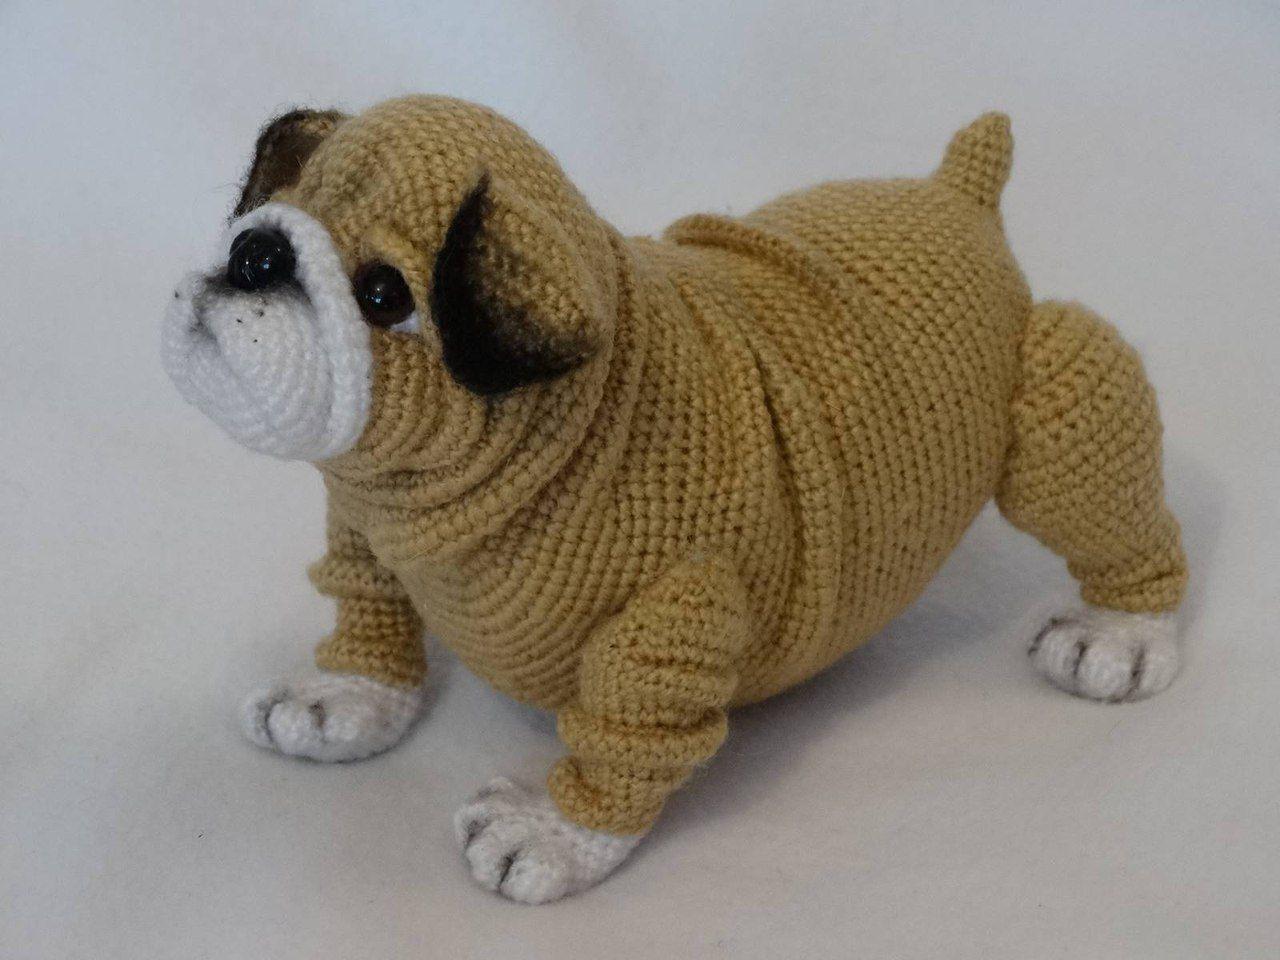 Amigurumi Lion Perritos : Buldog amirigumi pinterest amigurumi patterns crochet and